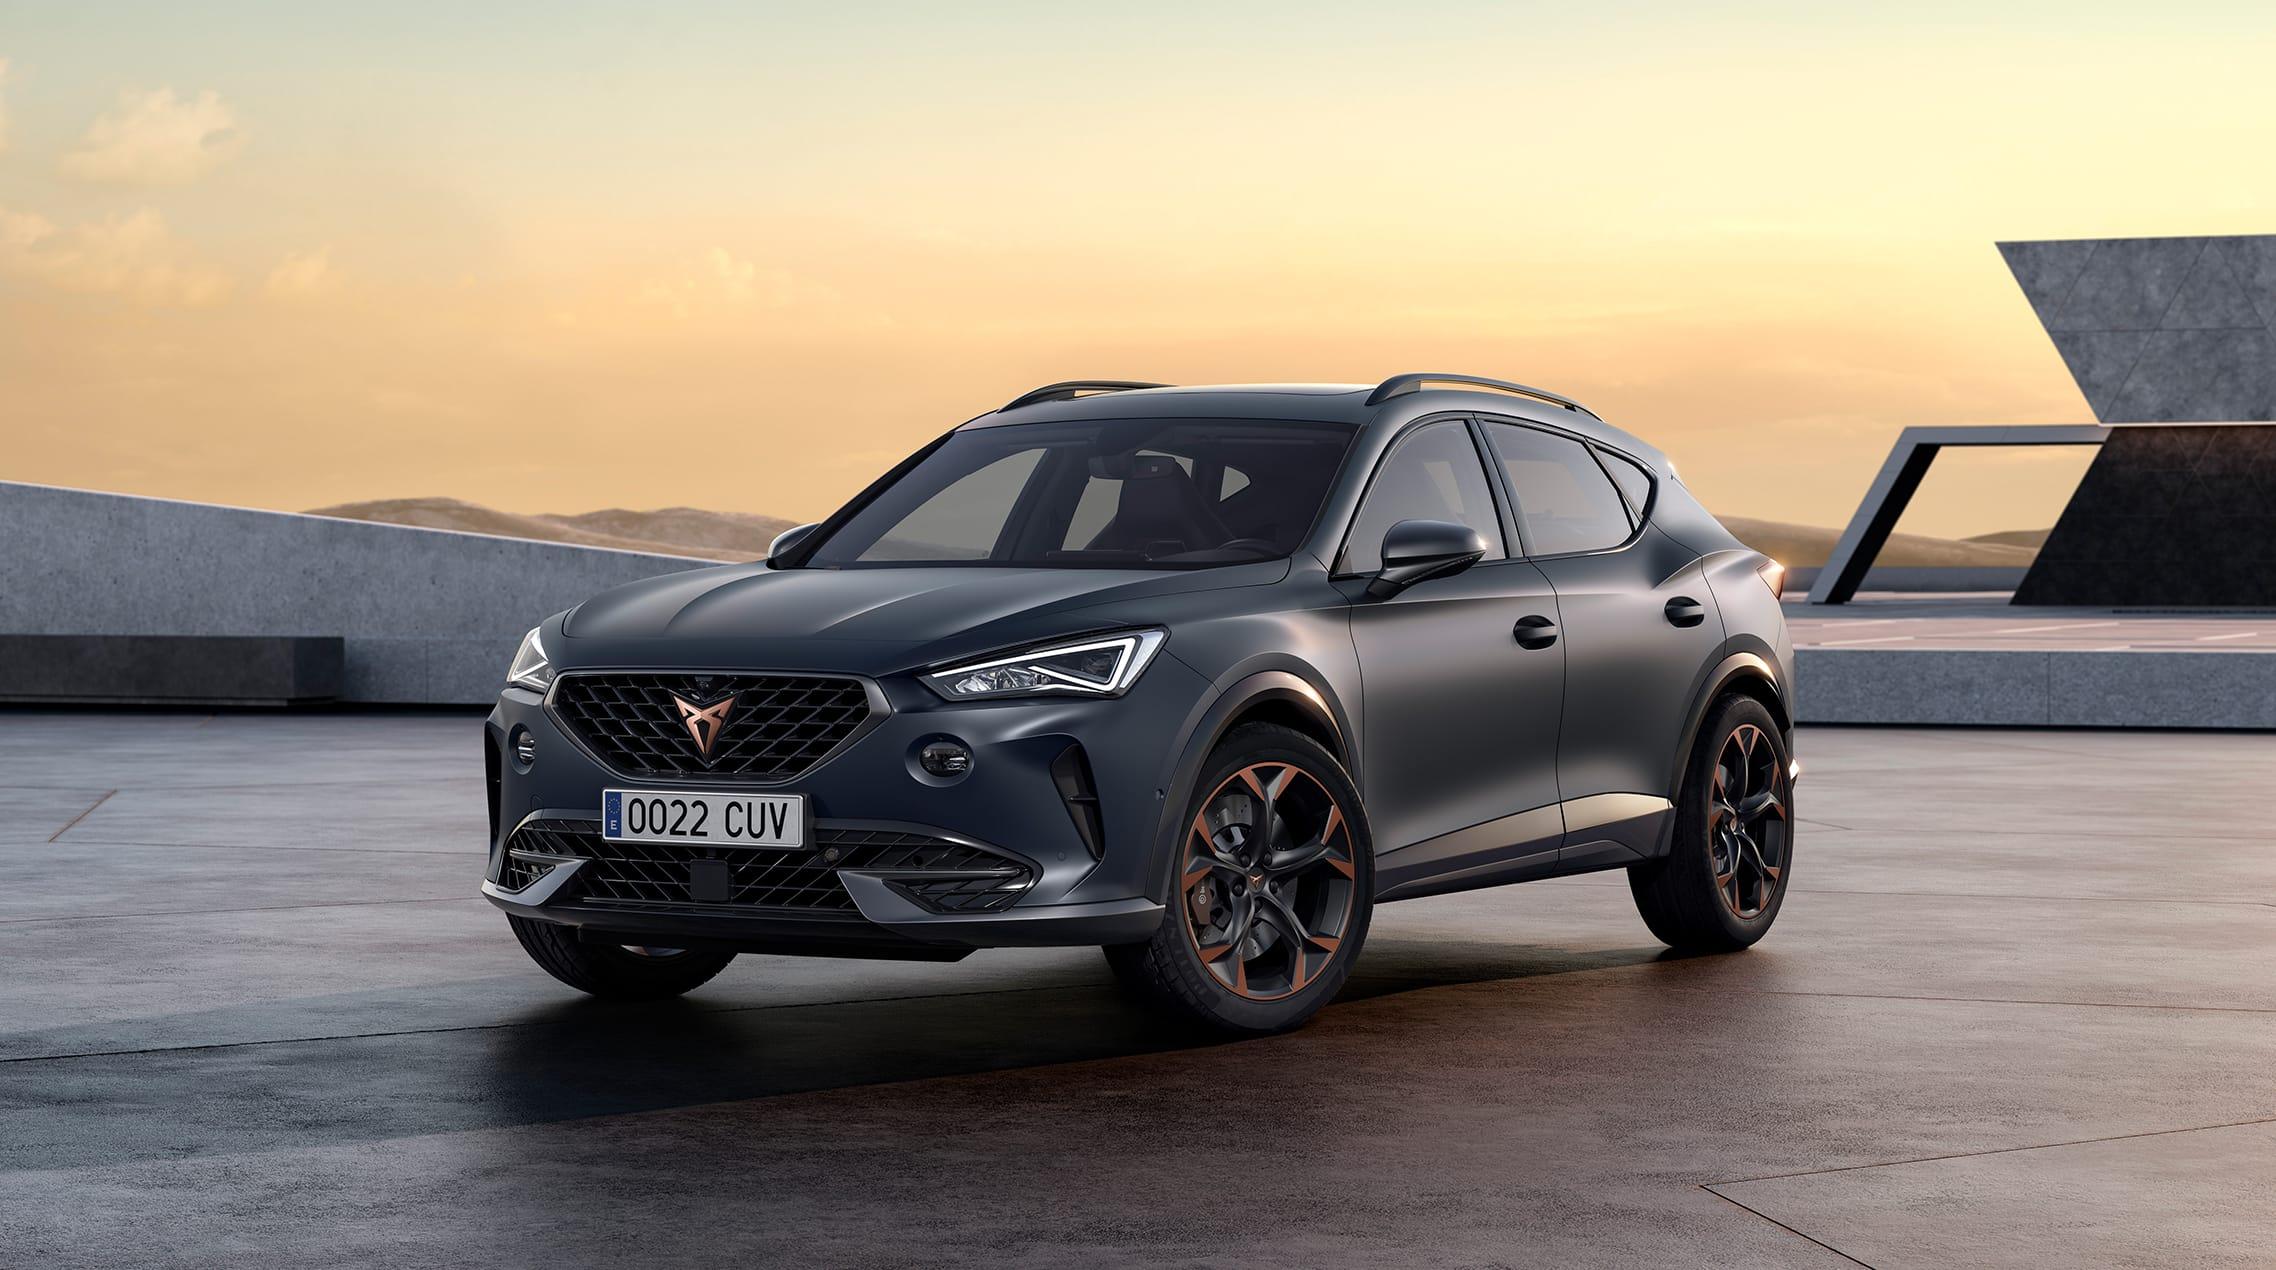 new cupra formentor suv coupe high performance 1.4 tsi e-hybrid phev with 245 horsepower